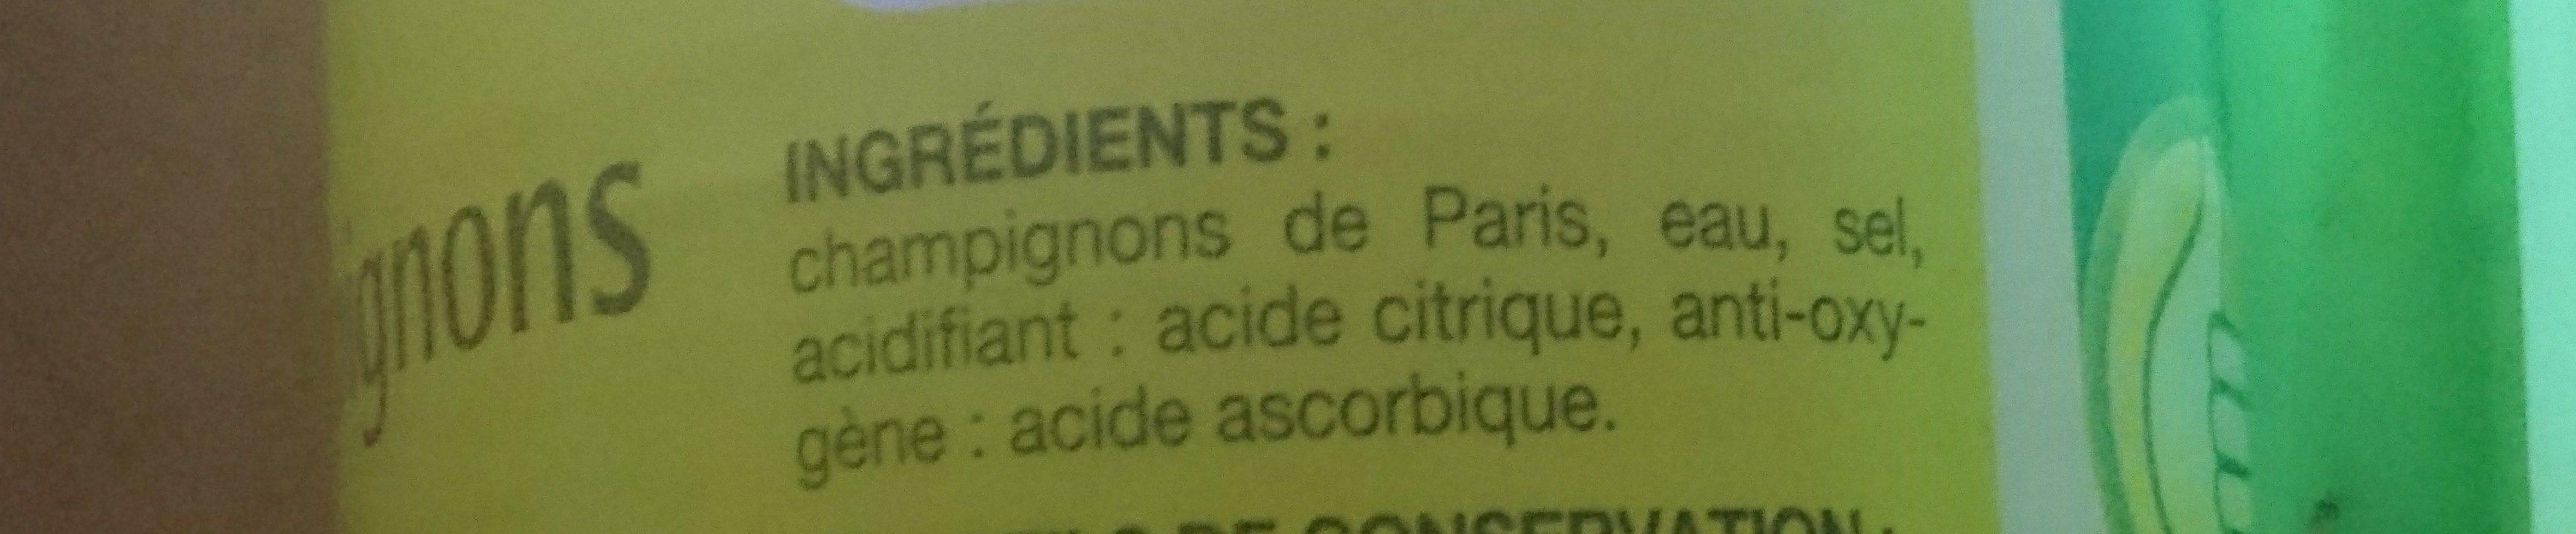 Champignons entier de Paris en conserve - Ingrediënten